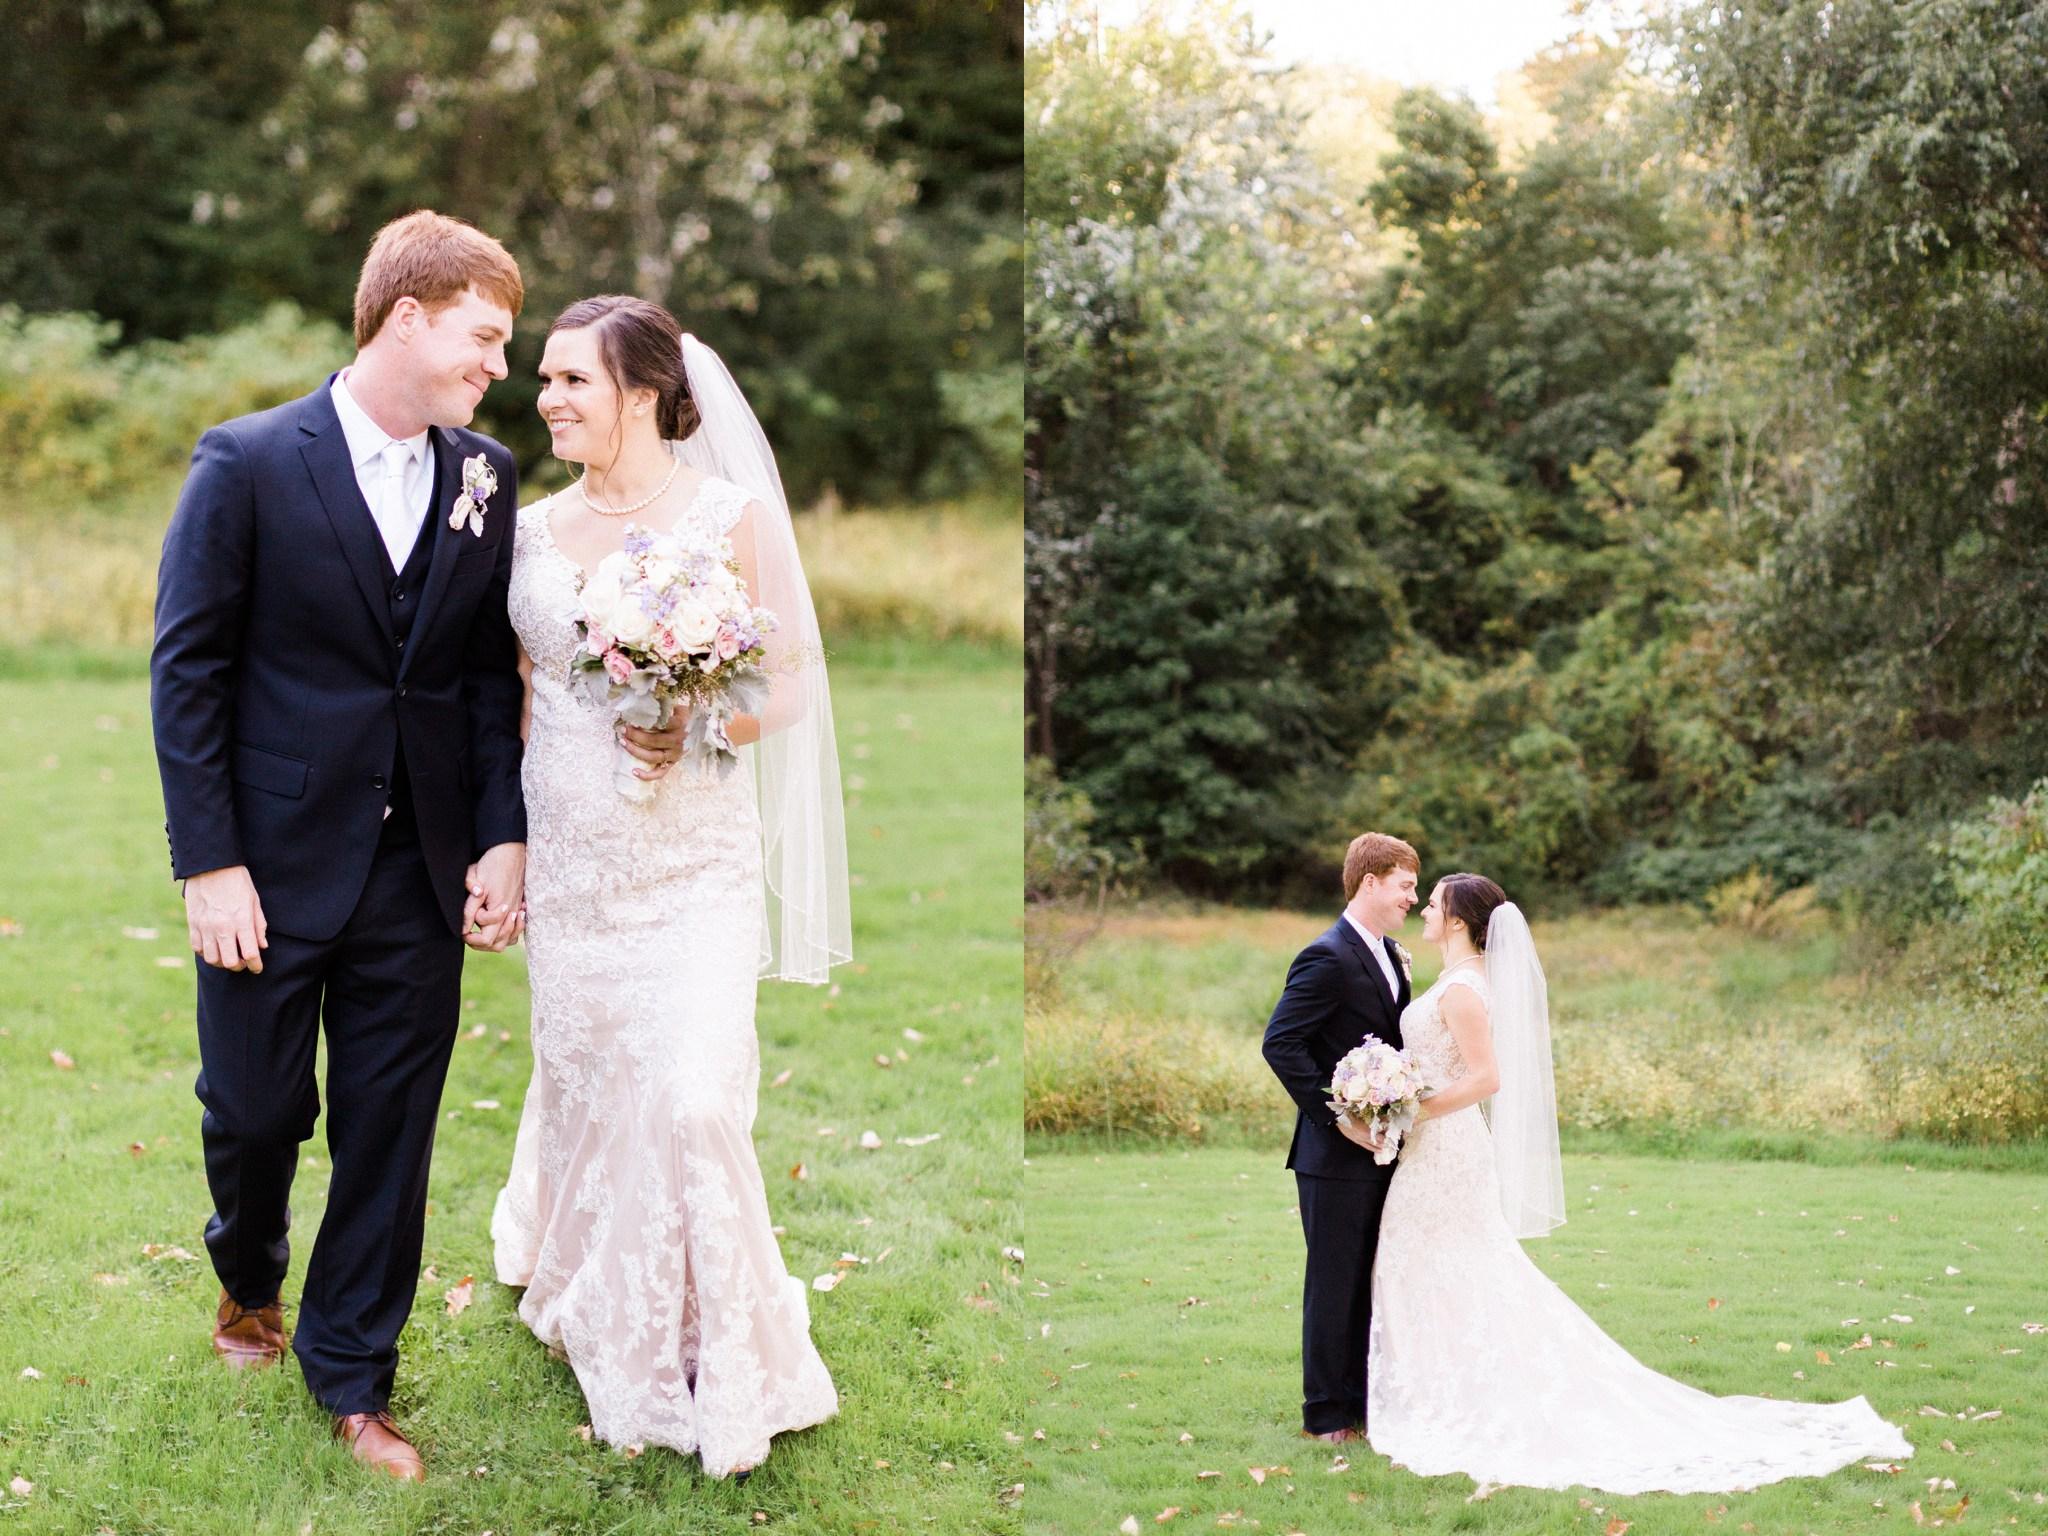 Fall_new_england_wedding_photos_00031.JPG